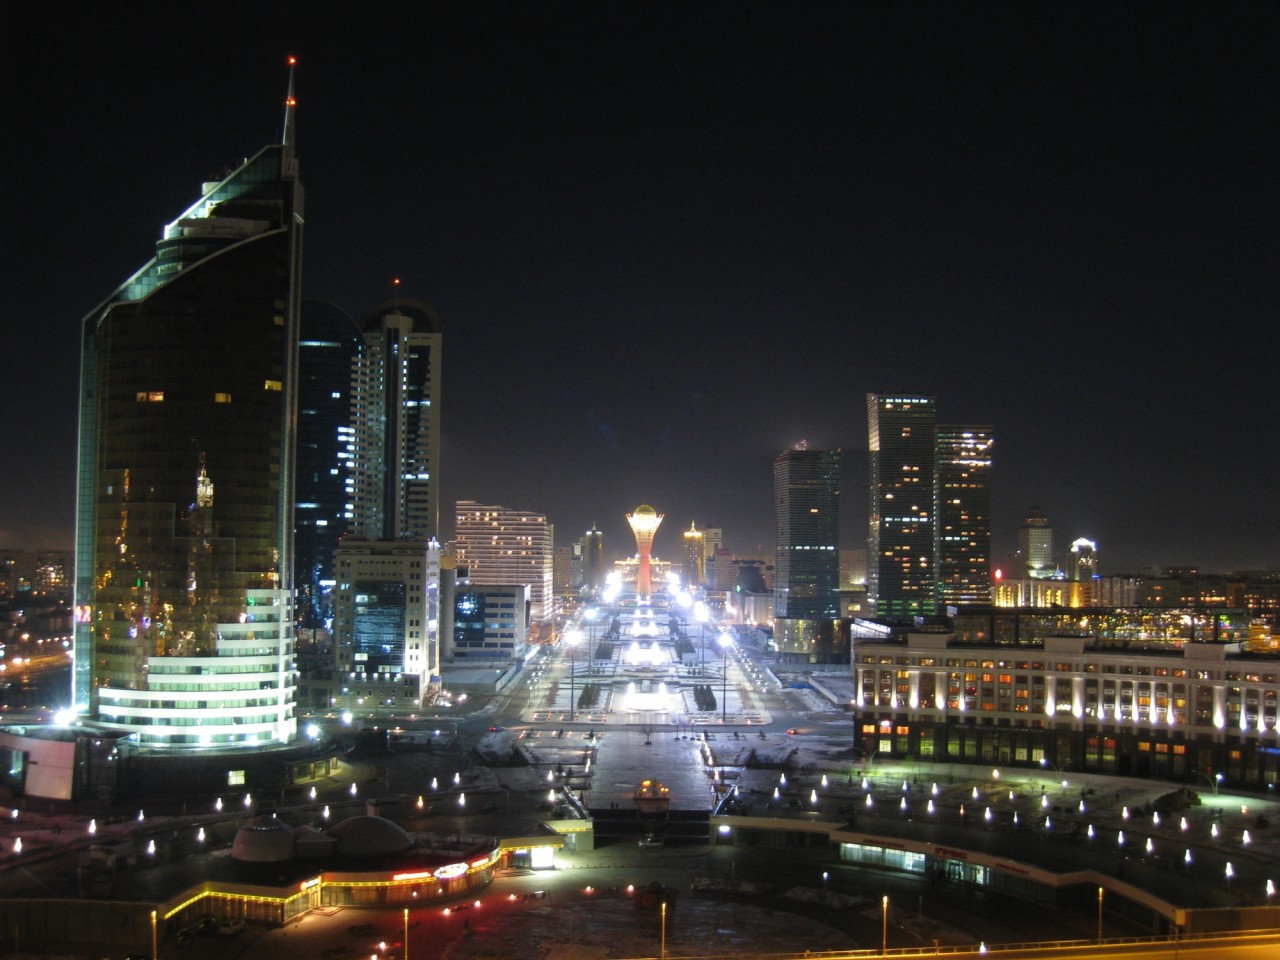 Ночная Астана Централазия, астана, мегаполис, скайлайн